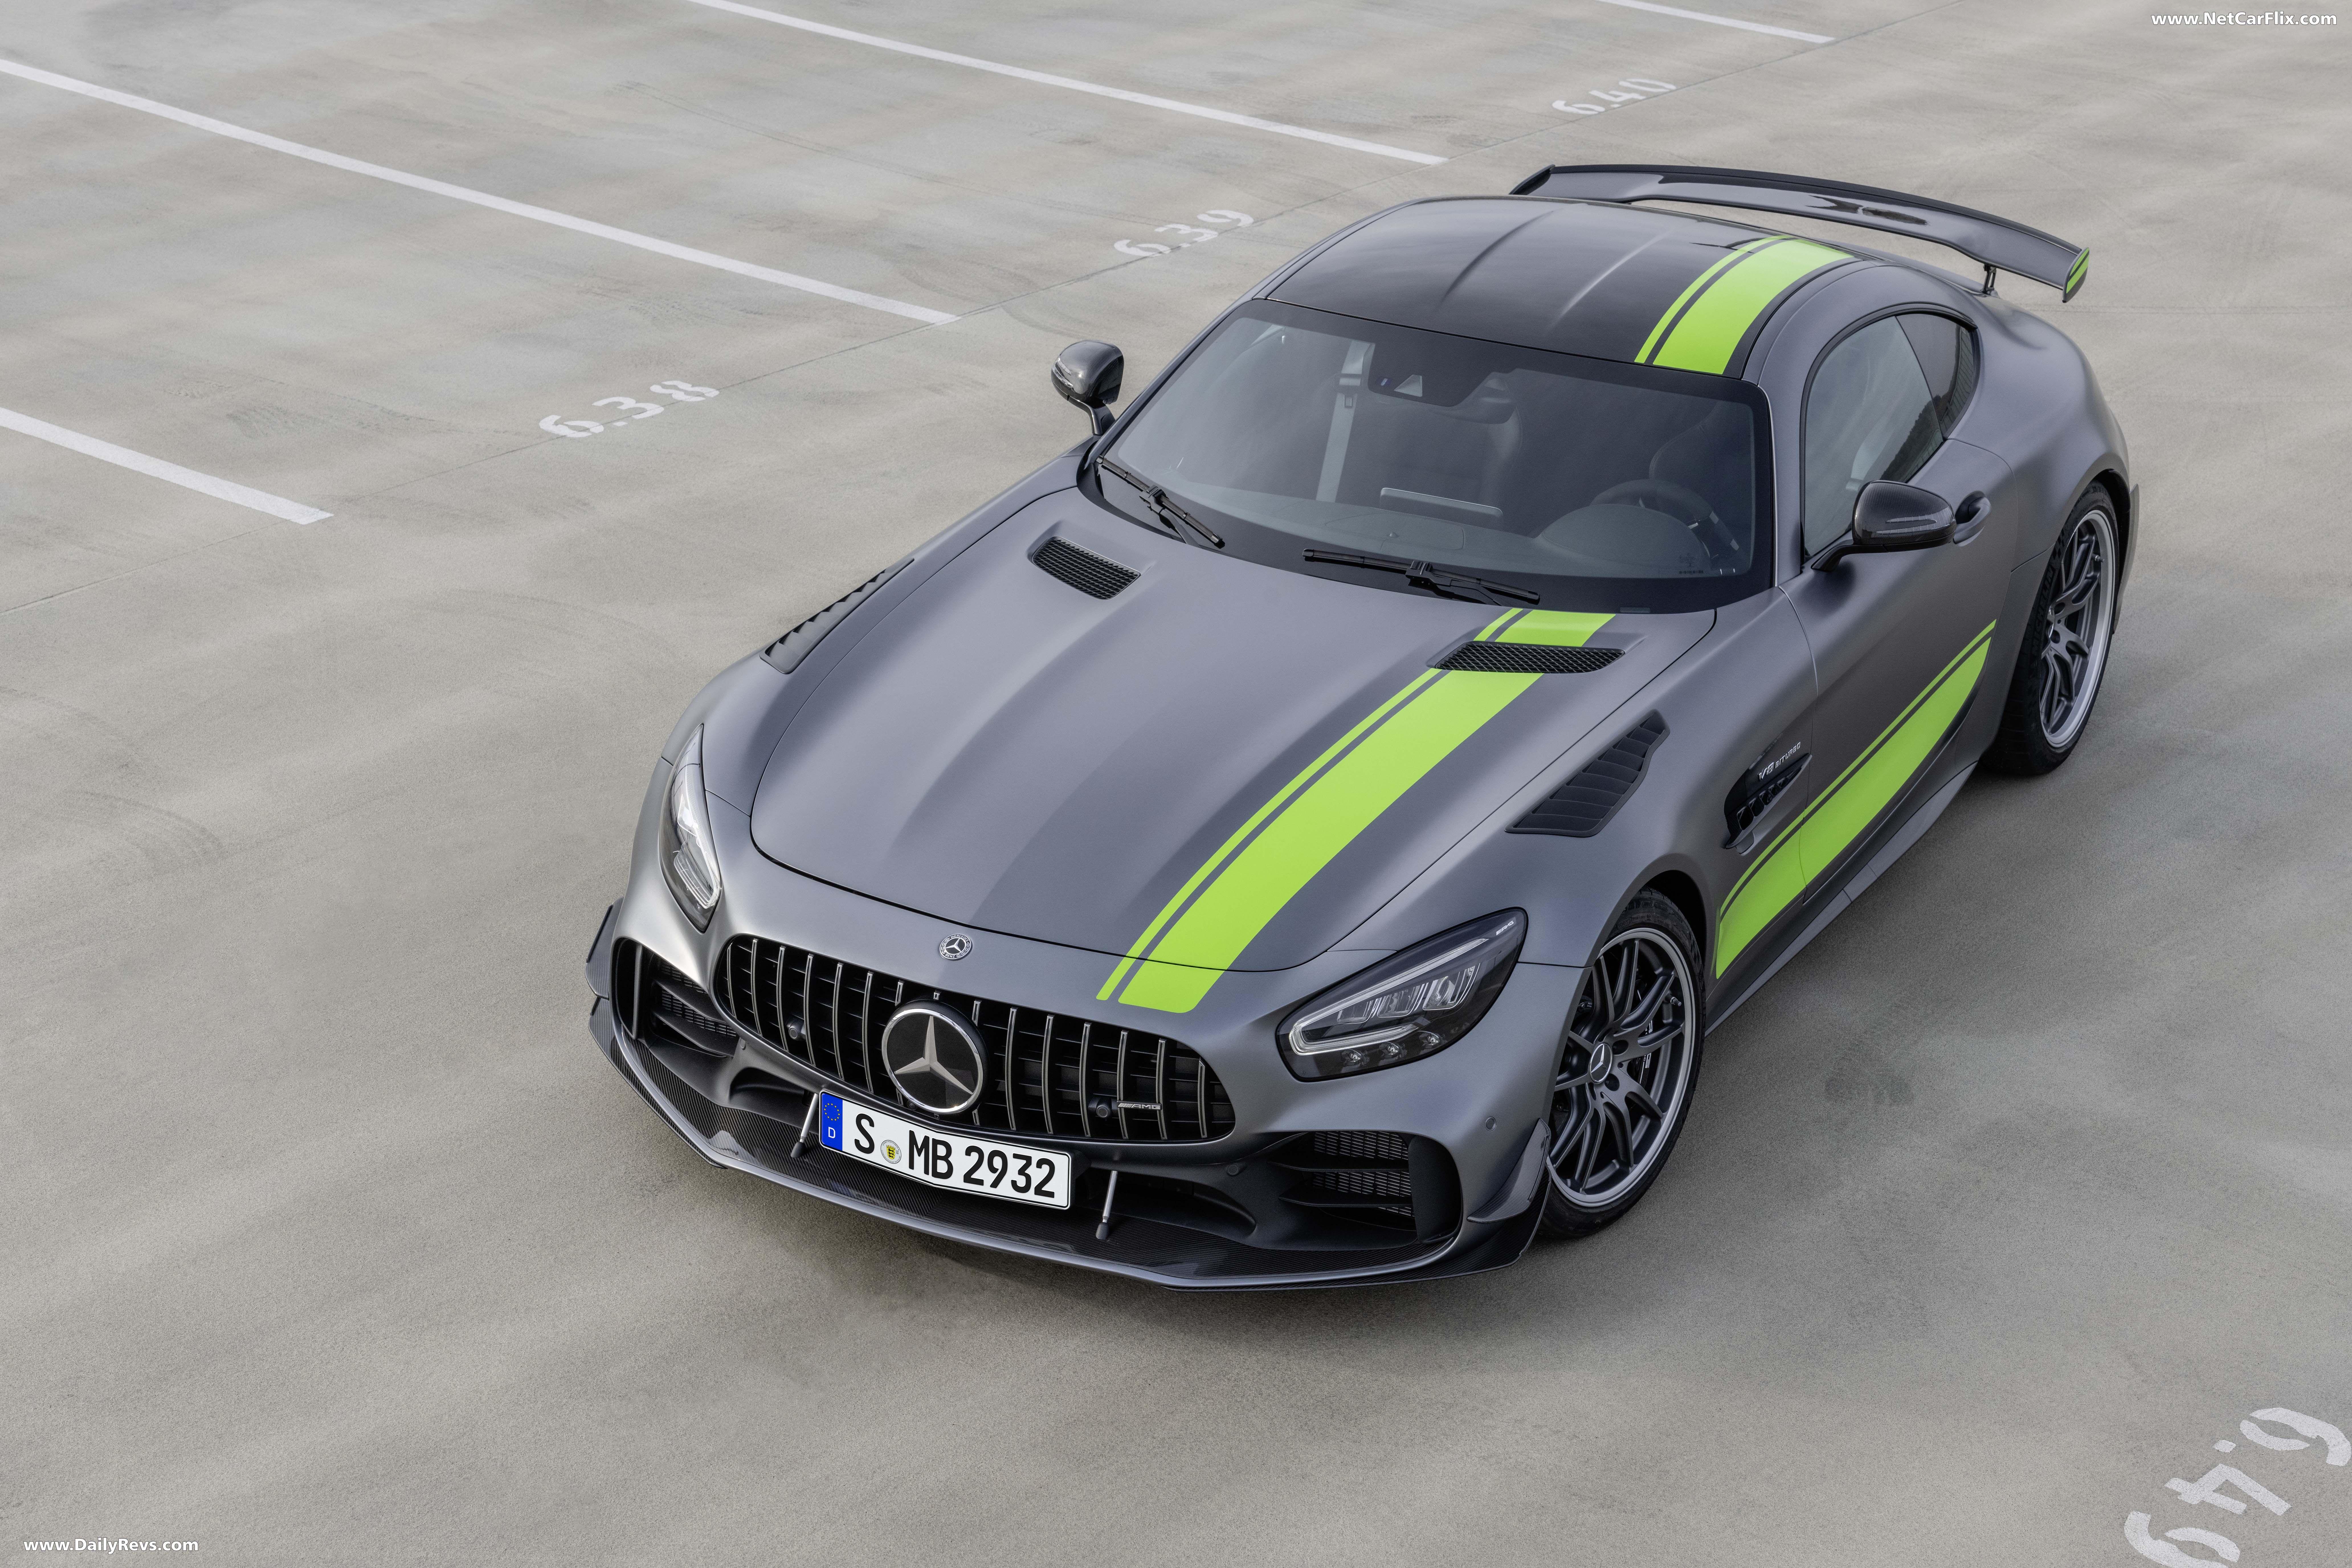 2020 Mercedes Benz Amg Gt R Pro Dailyrevs Com In 2020 Mercedes Amg Gt R Mercedes Amg Mercedes Benz Amg